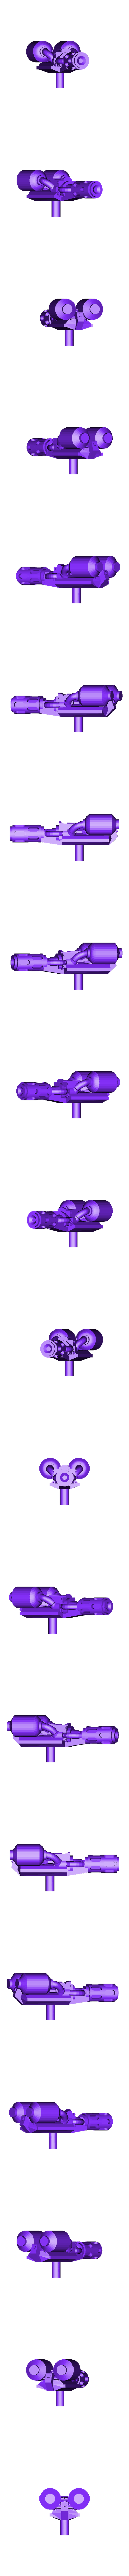 Top_Melta.stl Download free STL file Cronusine Pattern Terminator Builder • 3D printing template, HappyDuck3D